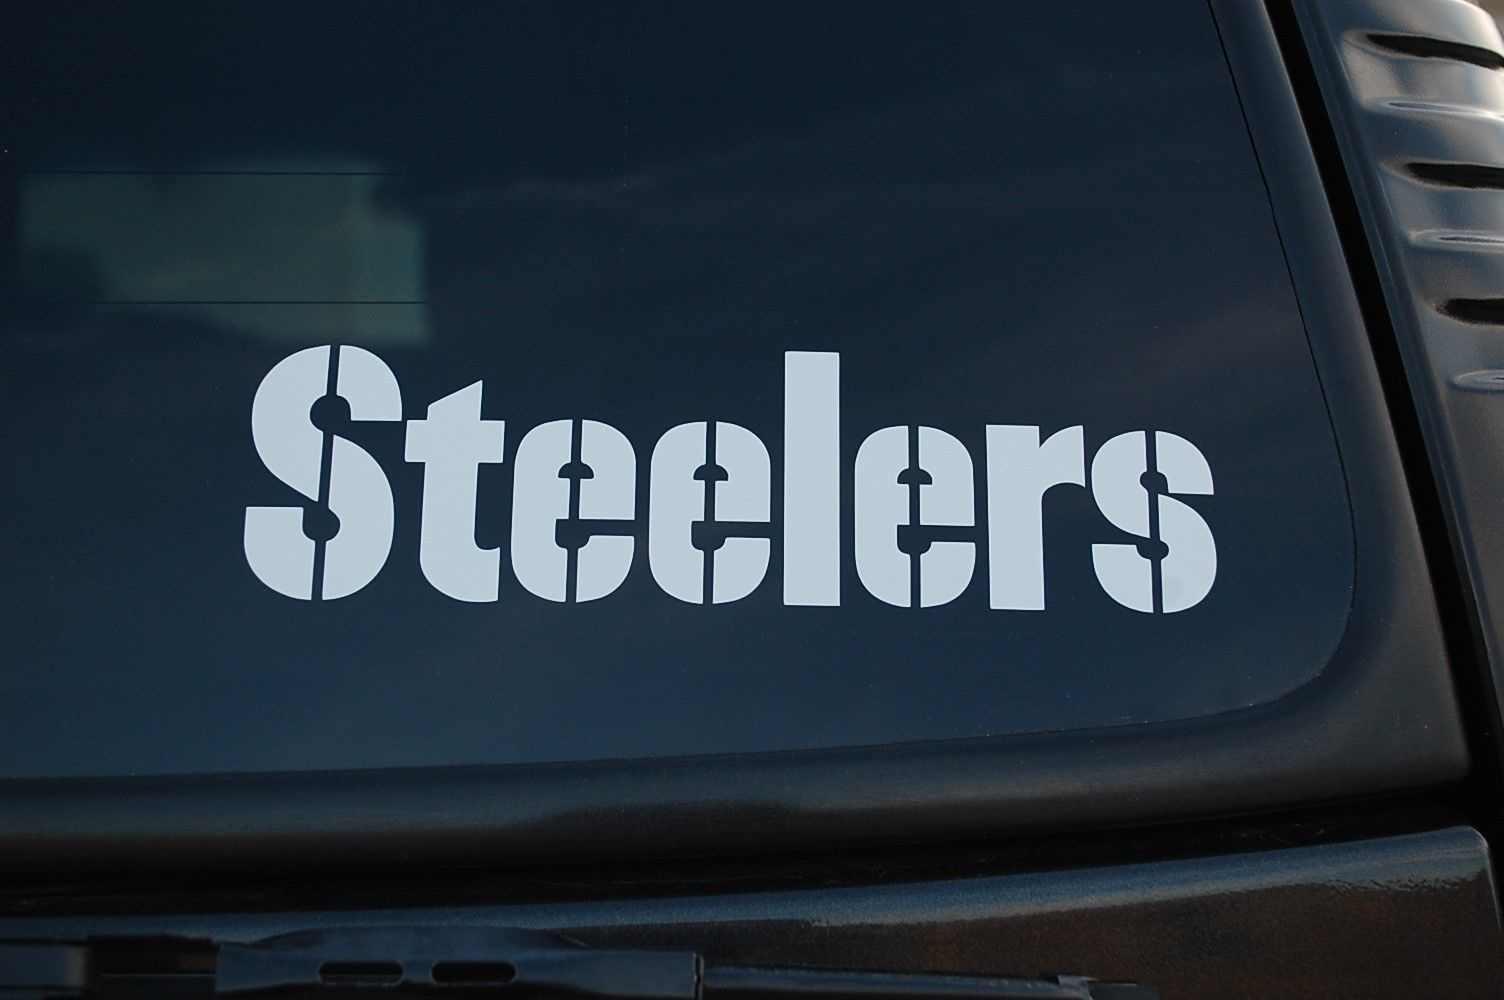 Steelers vinyl decal sticker high quality football 15cm